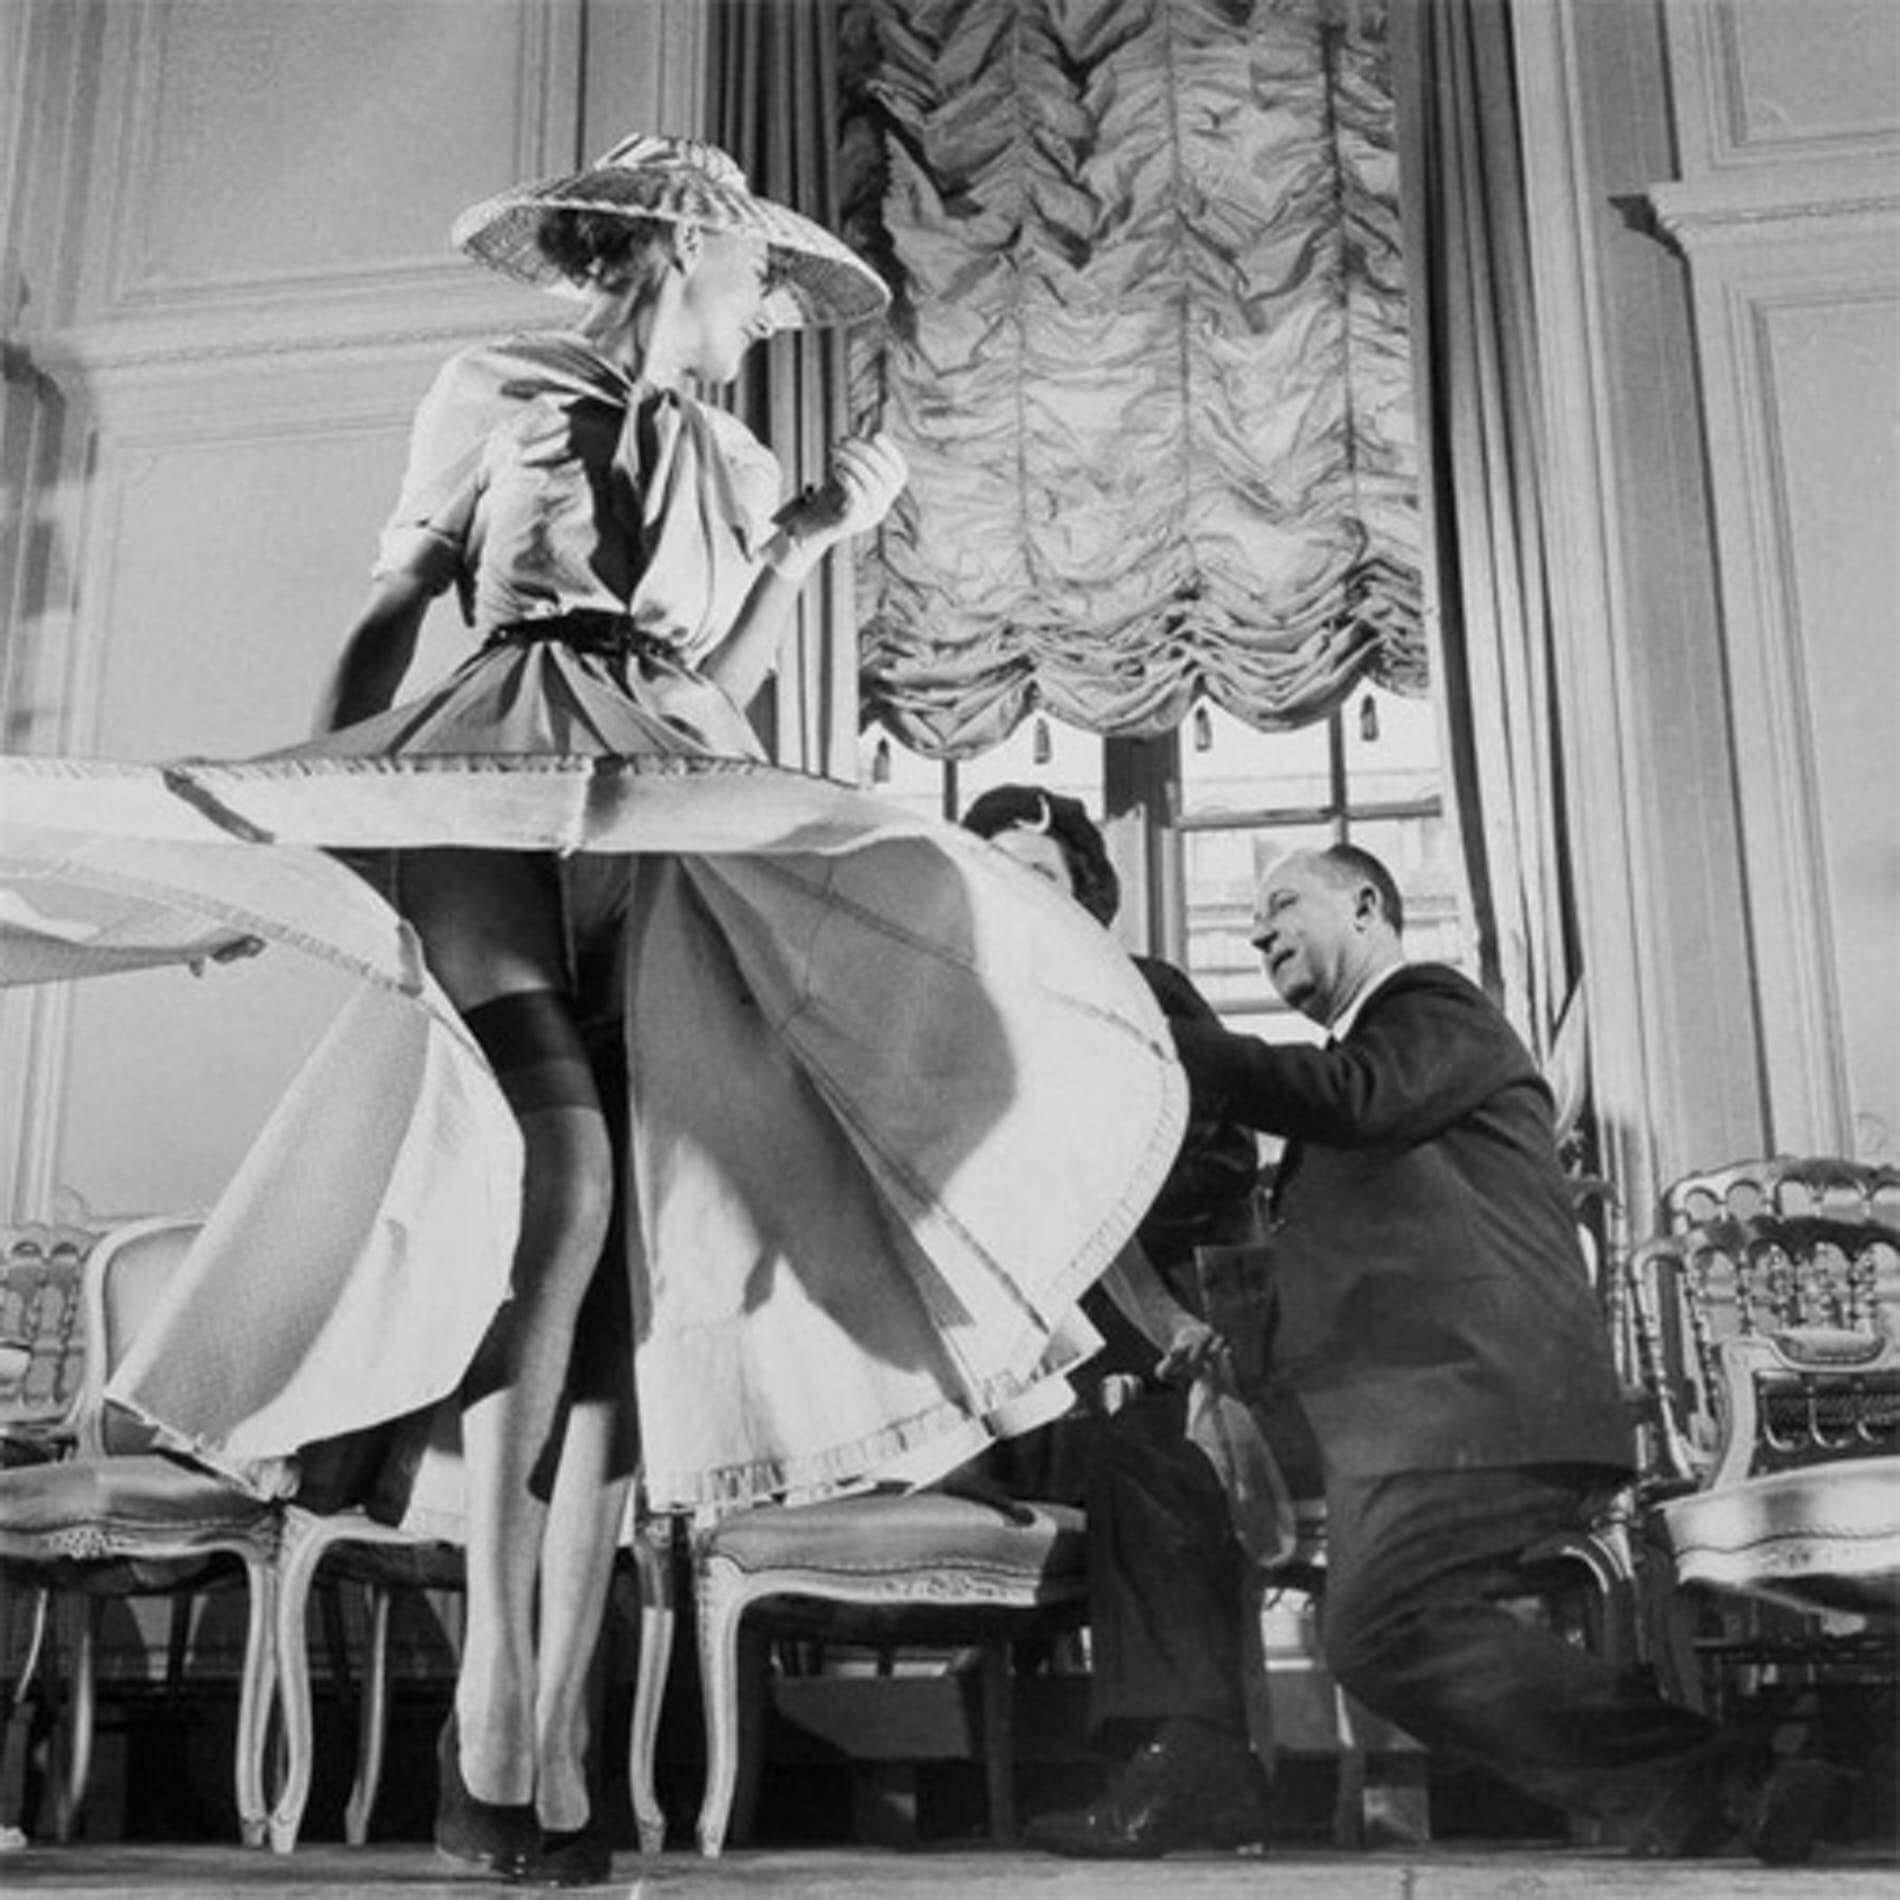 Mr. Dior一直視此花為自己的幸運符,亦以此花為靈感繆思。